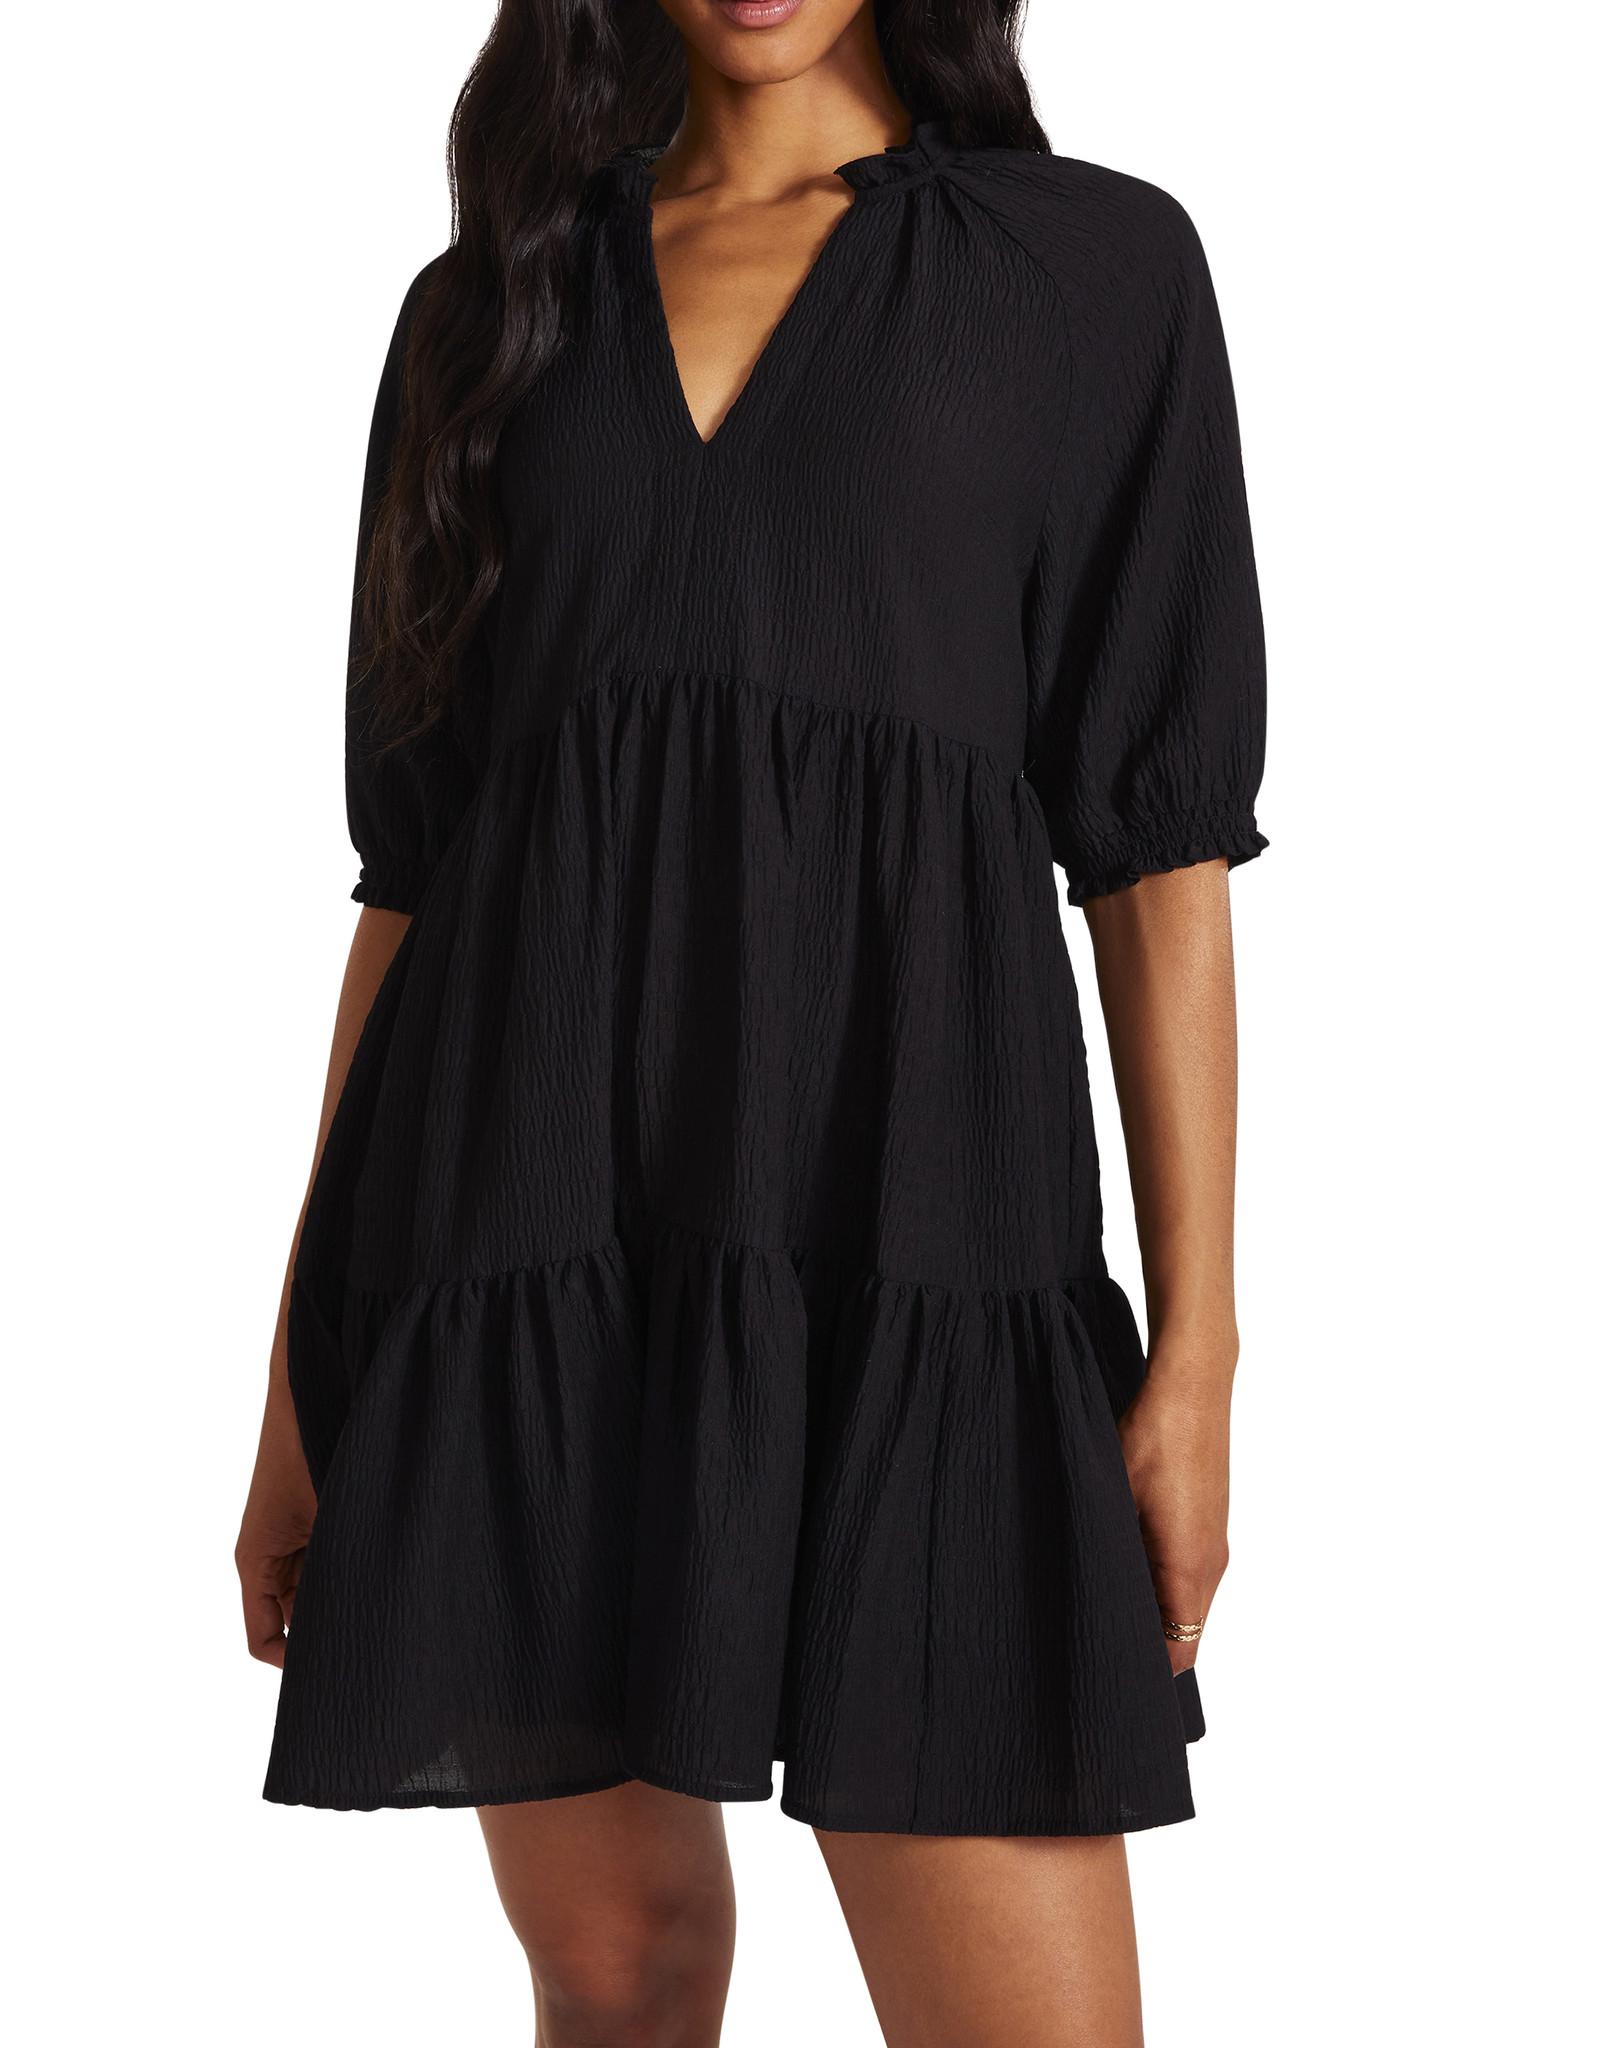 Bb Dakota Black Iced Tea Dress